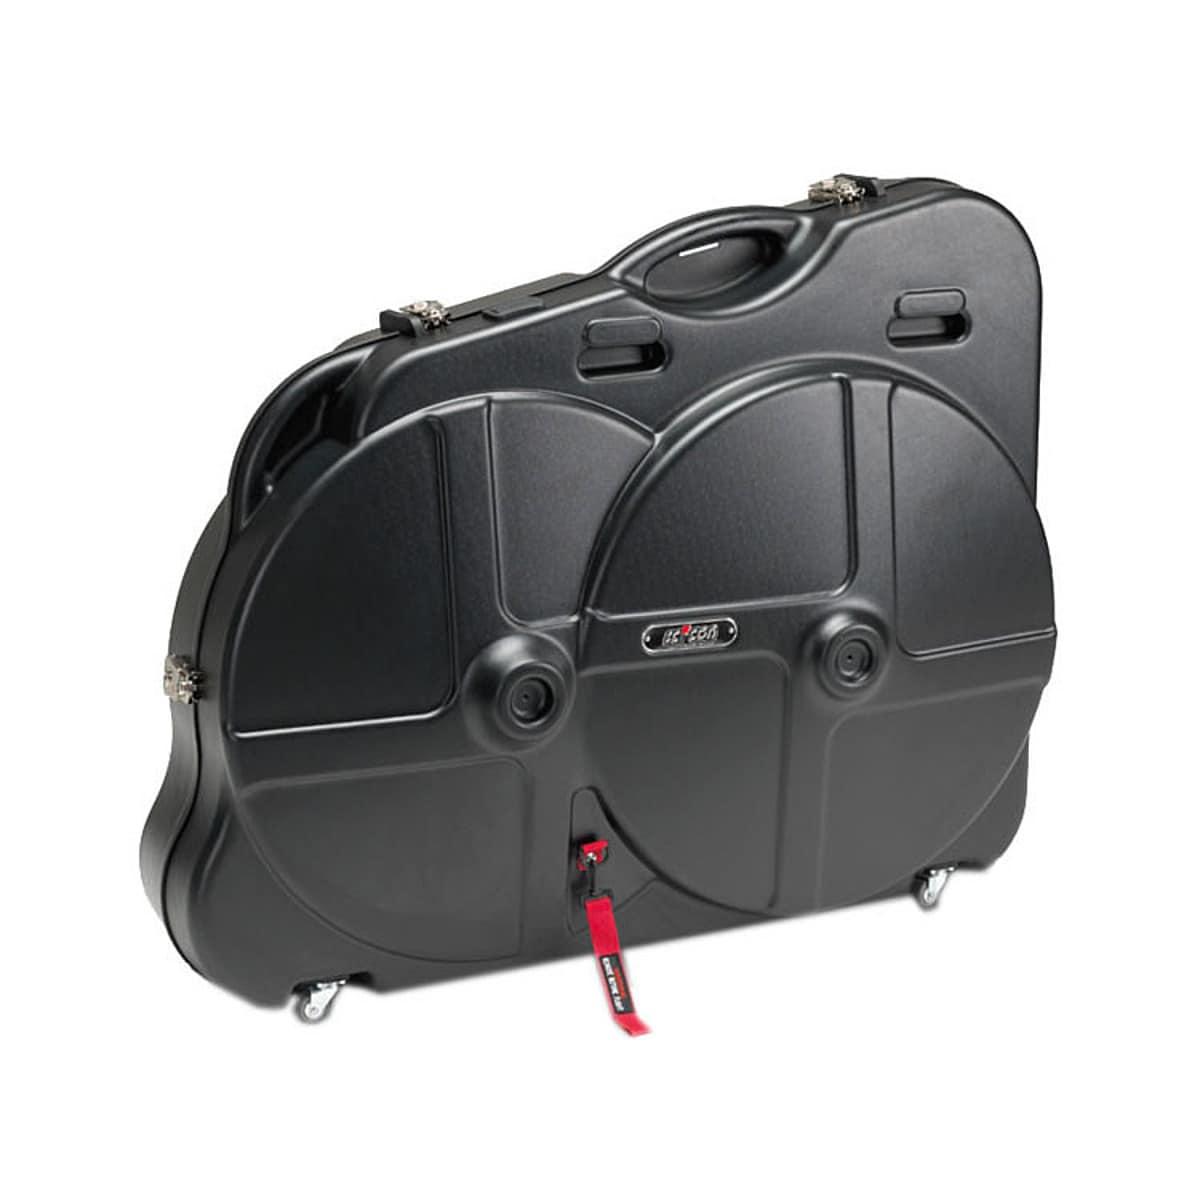 Mountain Bike Travel Bag For Sale